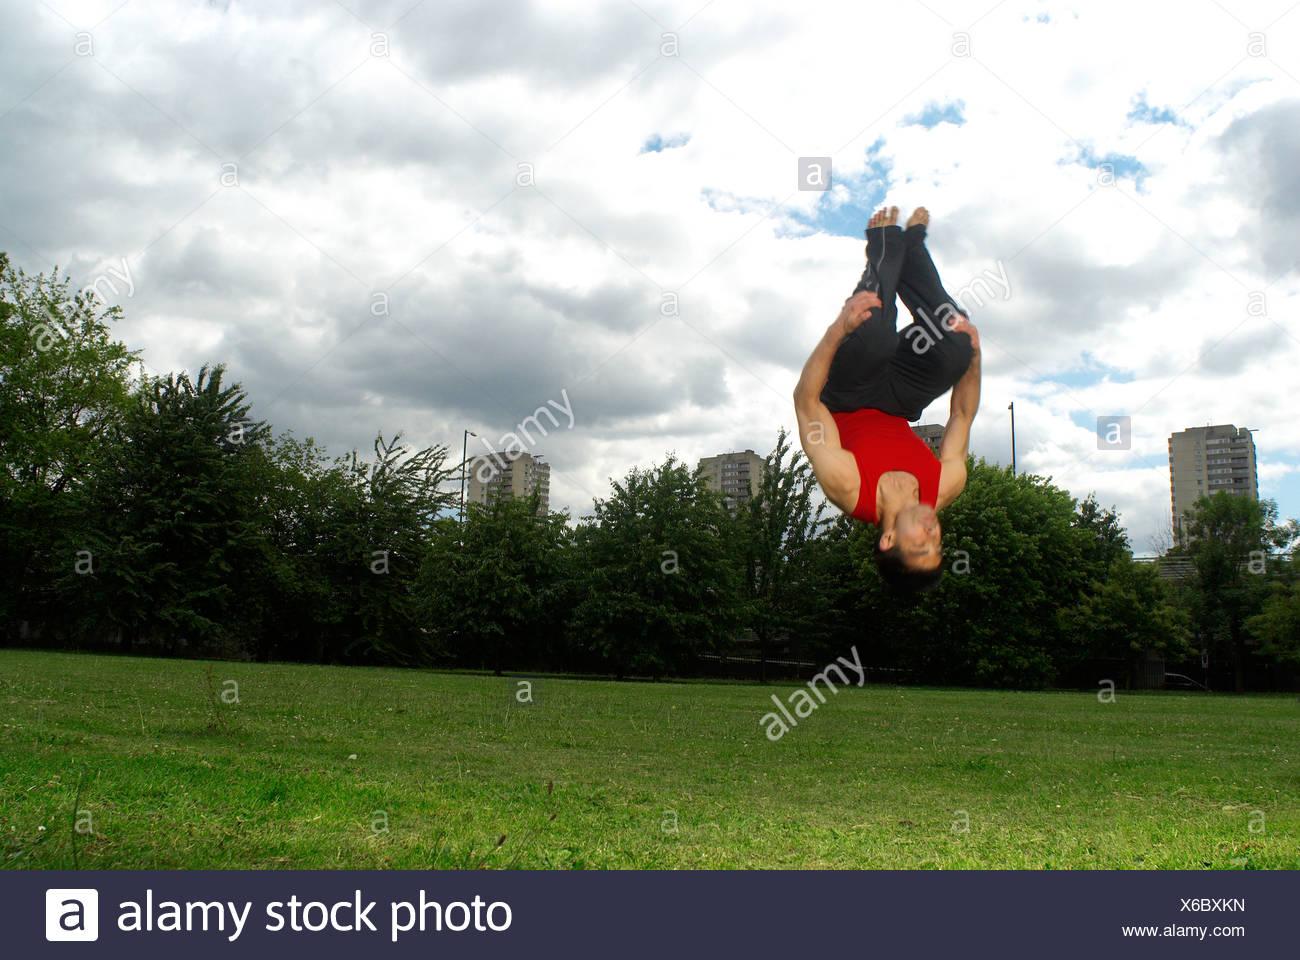 somersault in park Stock Photo